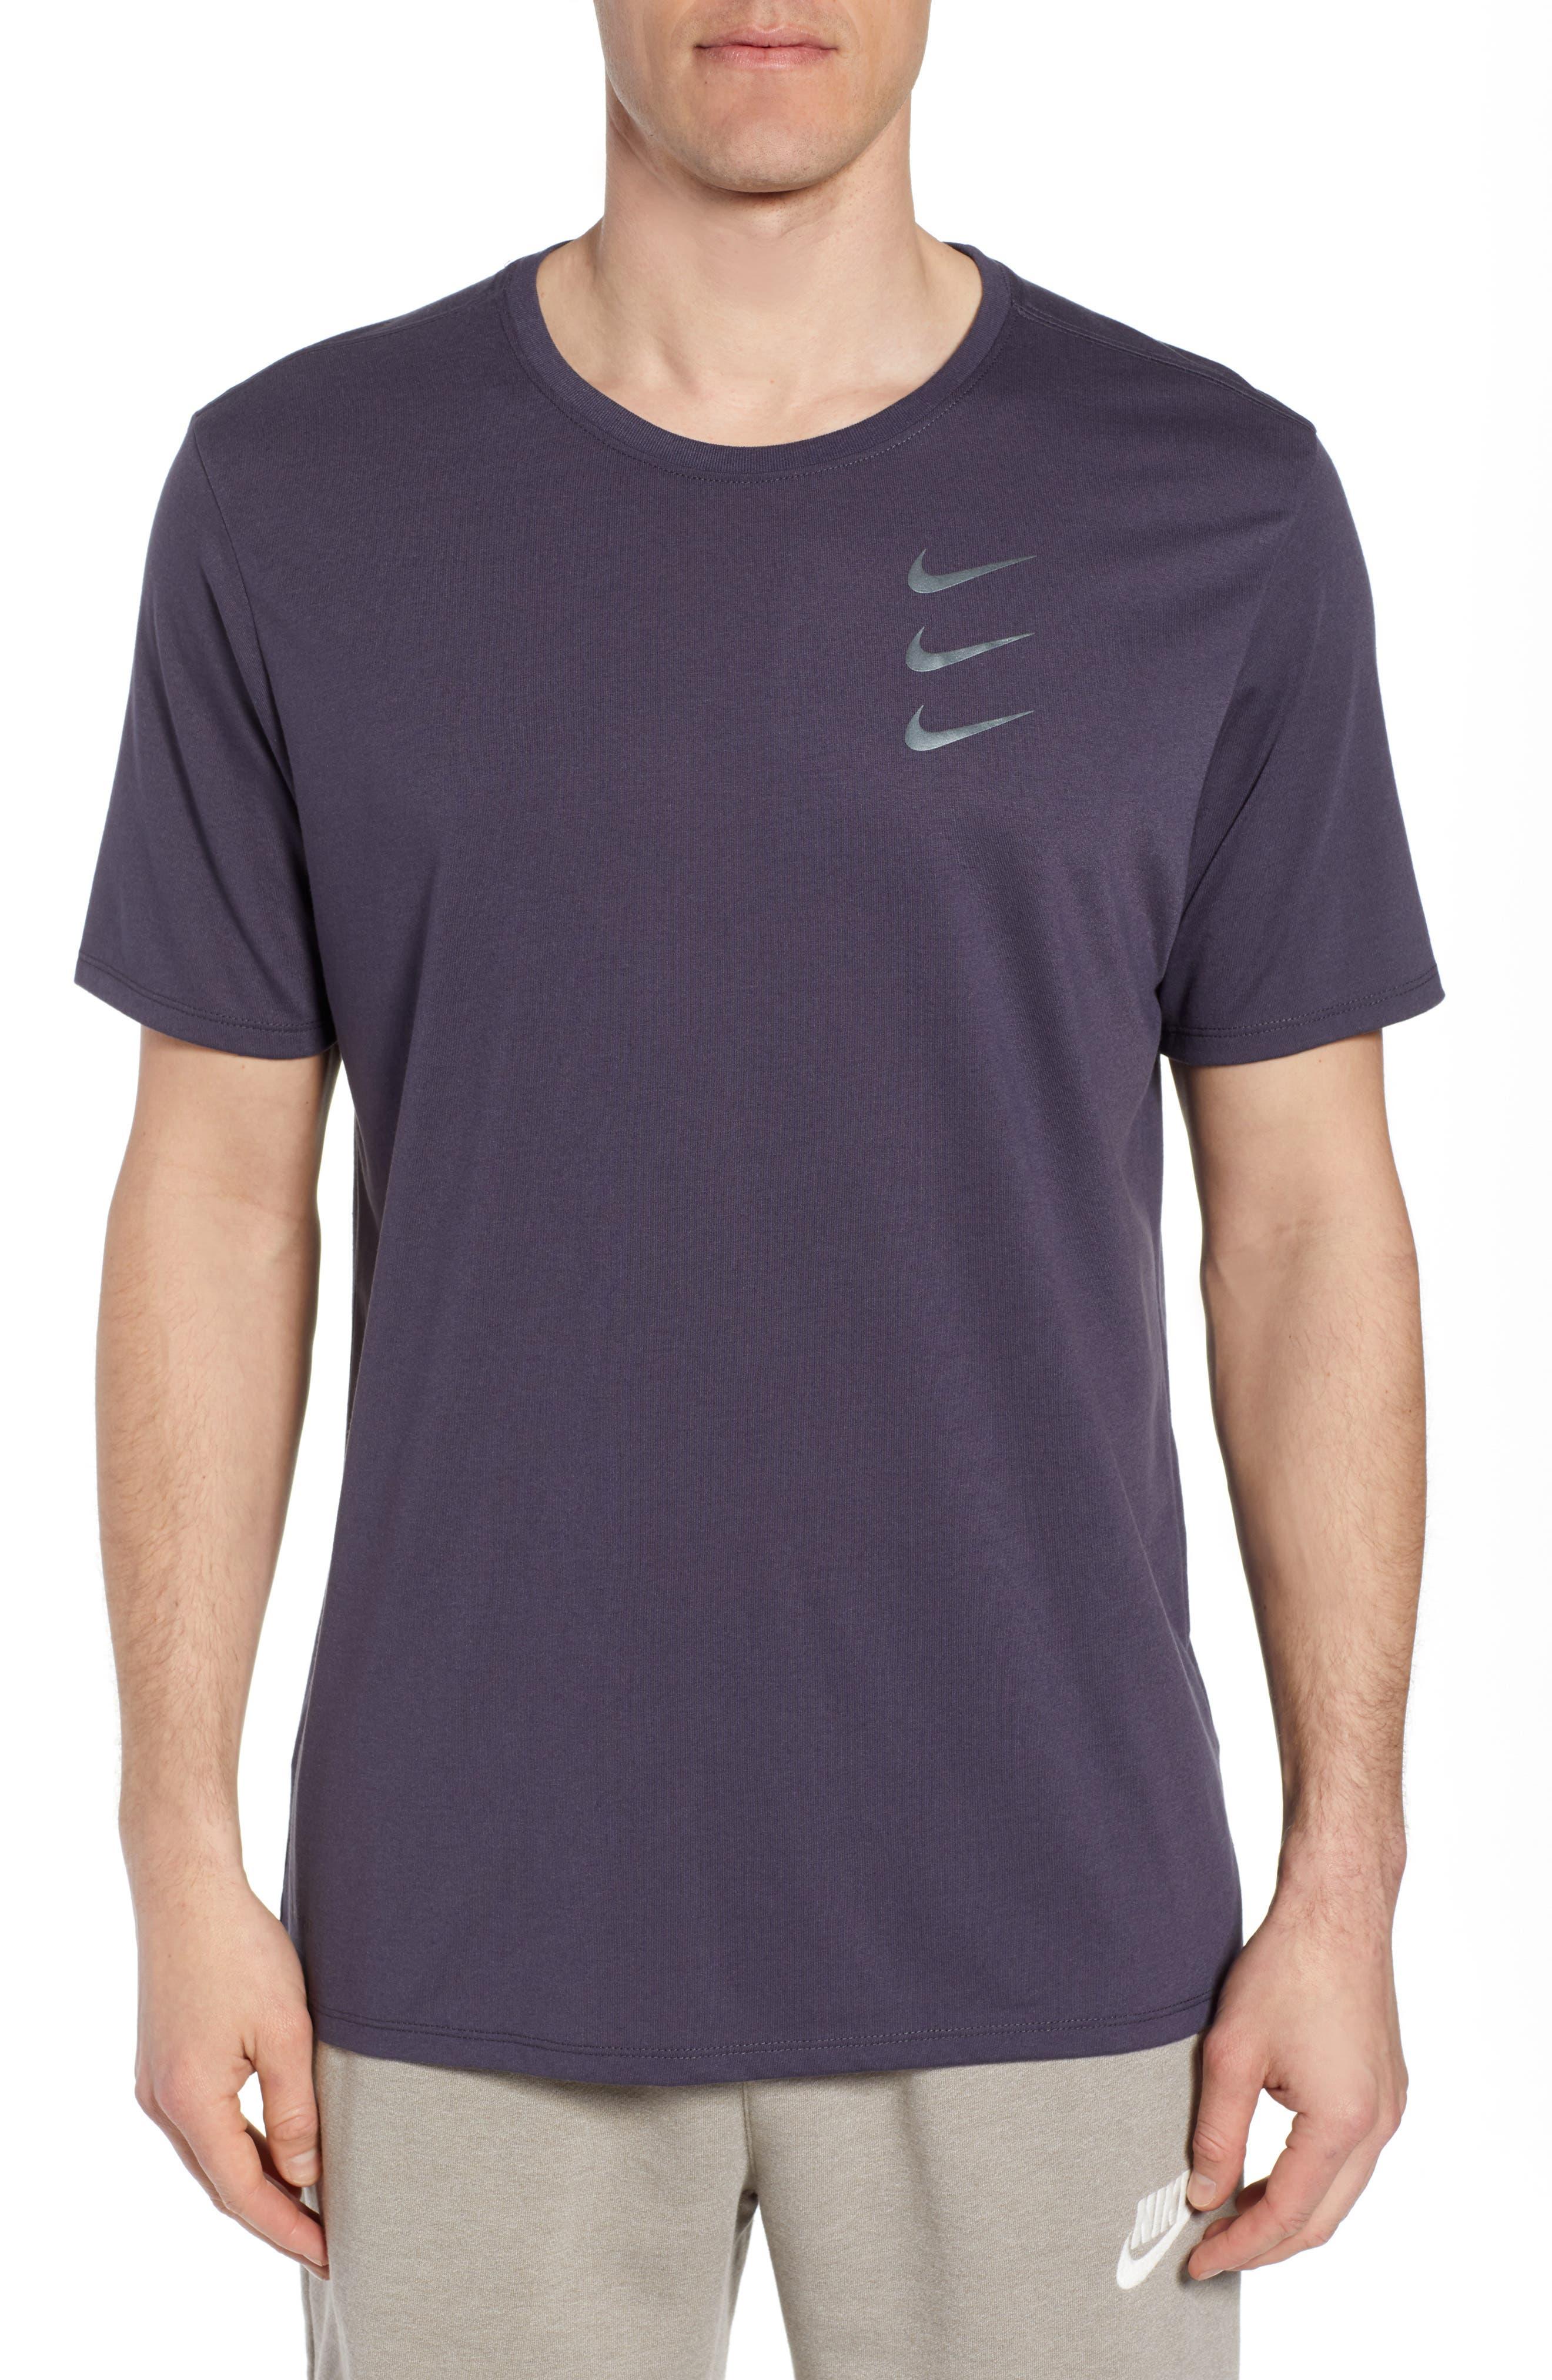 Dry Running Division T-Shirt,                             Main thumbnail 1, color,                             GRIDIRON/ GUNSMOKE